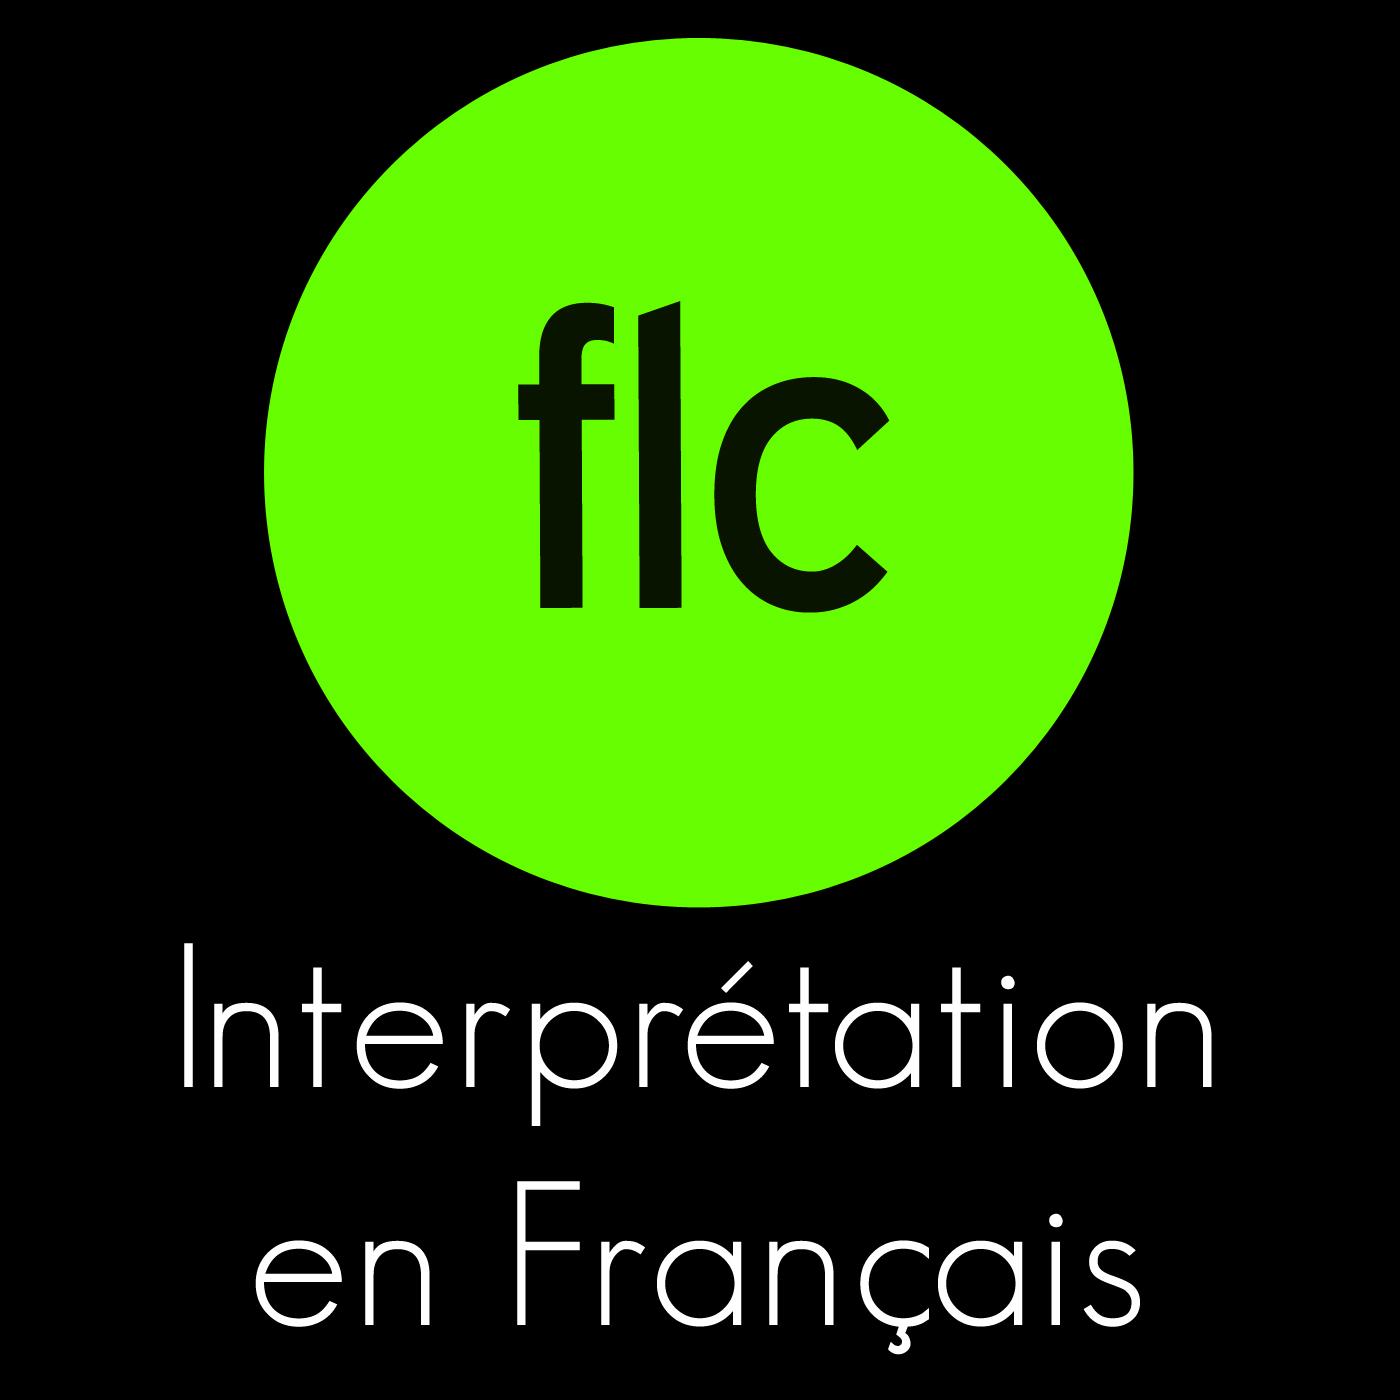 Family Life Church Interprétation en Français (French Interpretation)